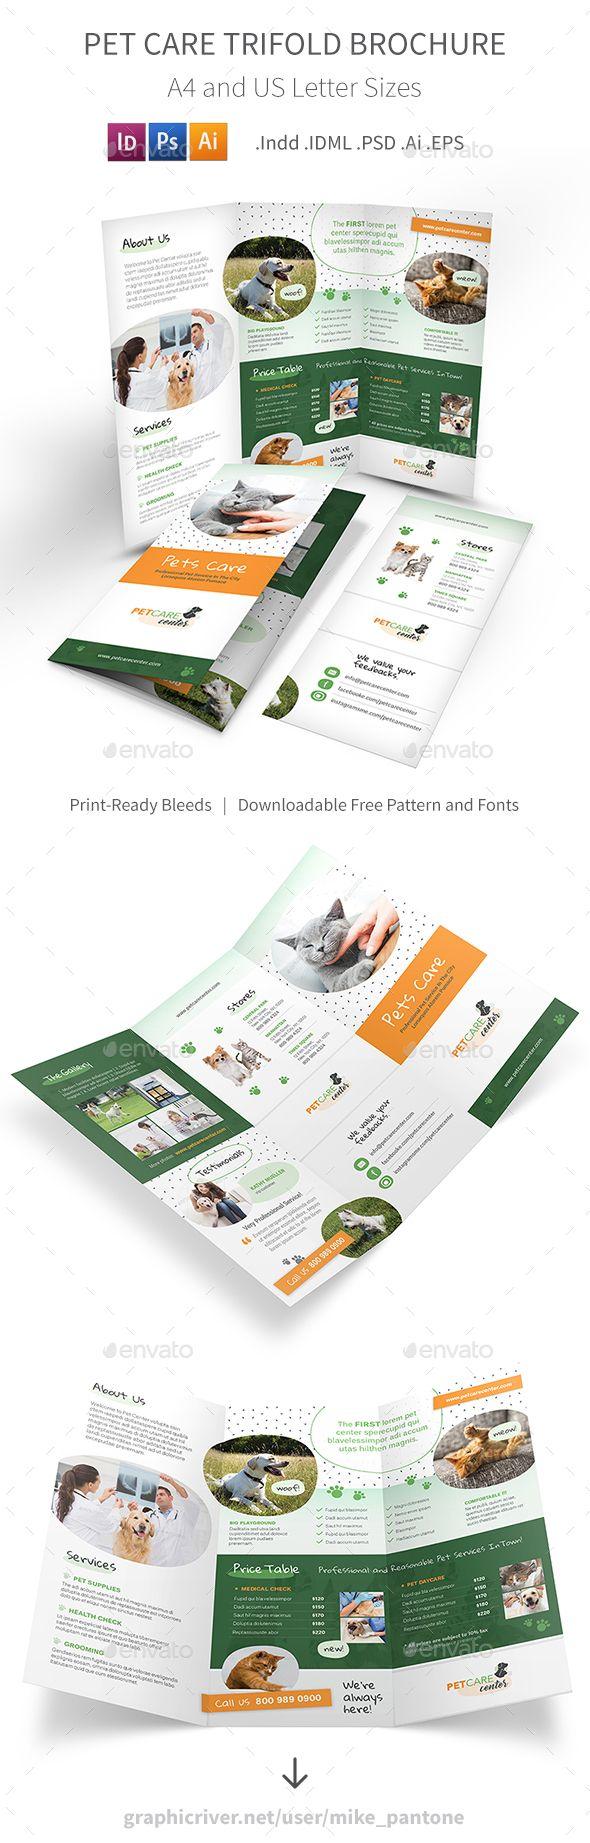 Pet Care Trifold Brochure 6   Elementos